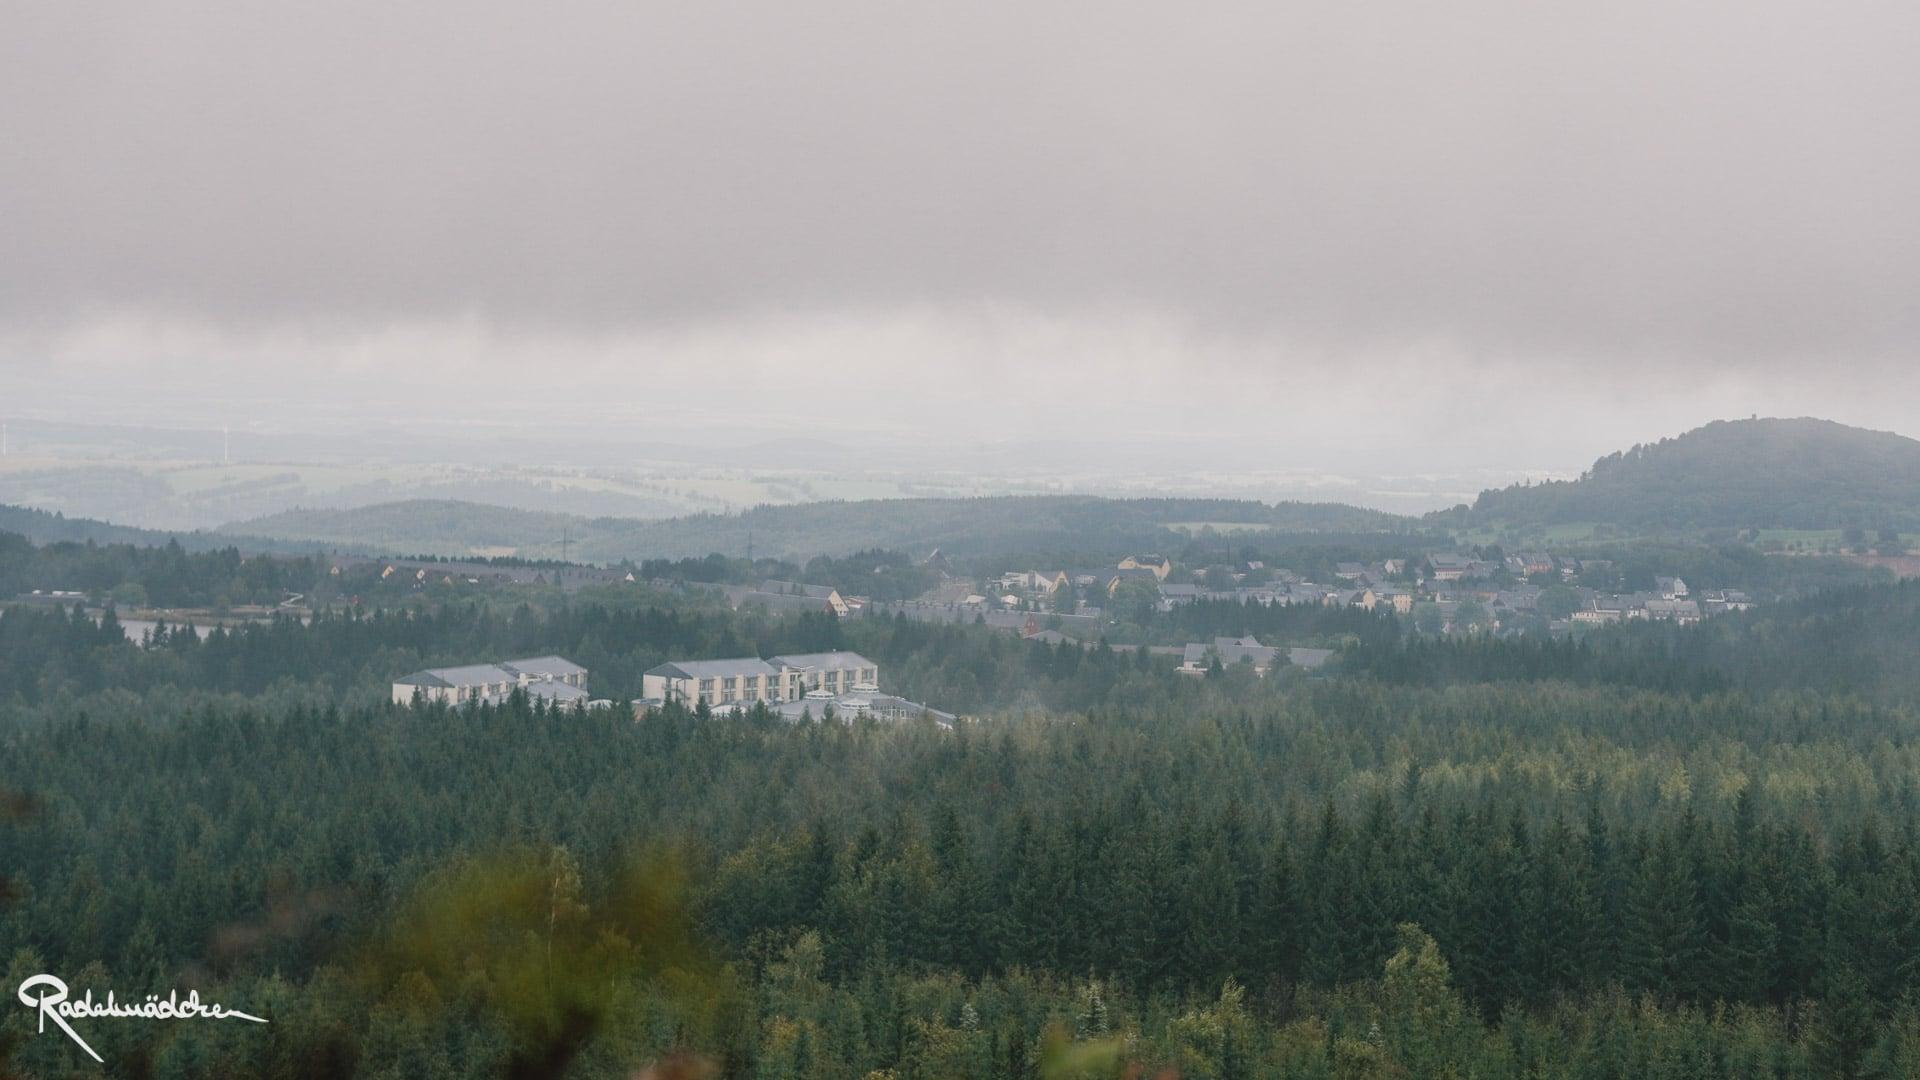 Nebel über der Landschaft